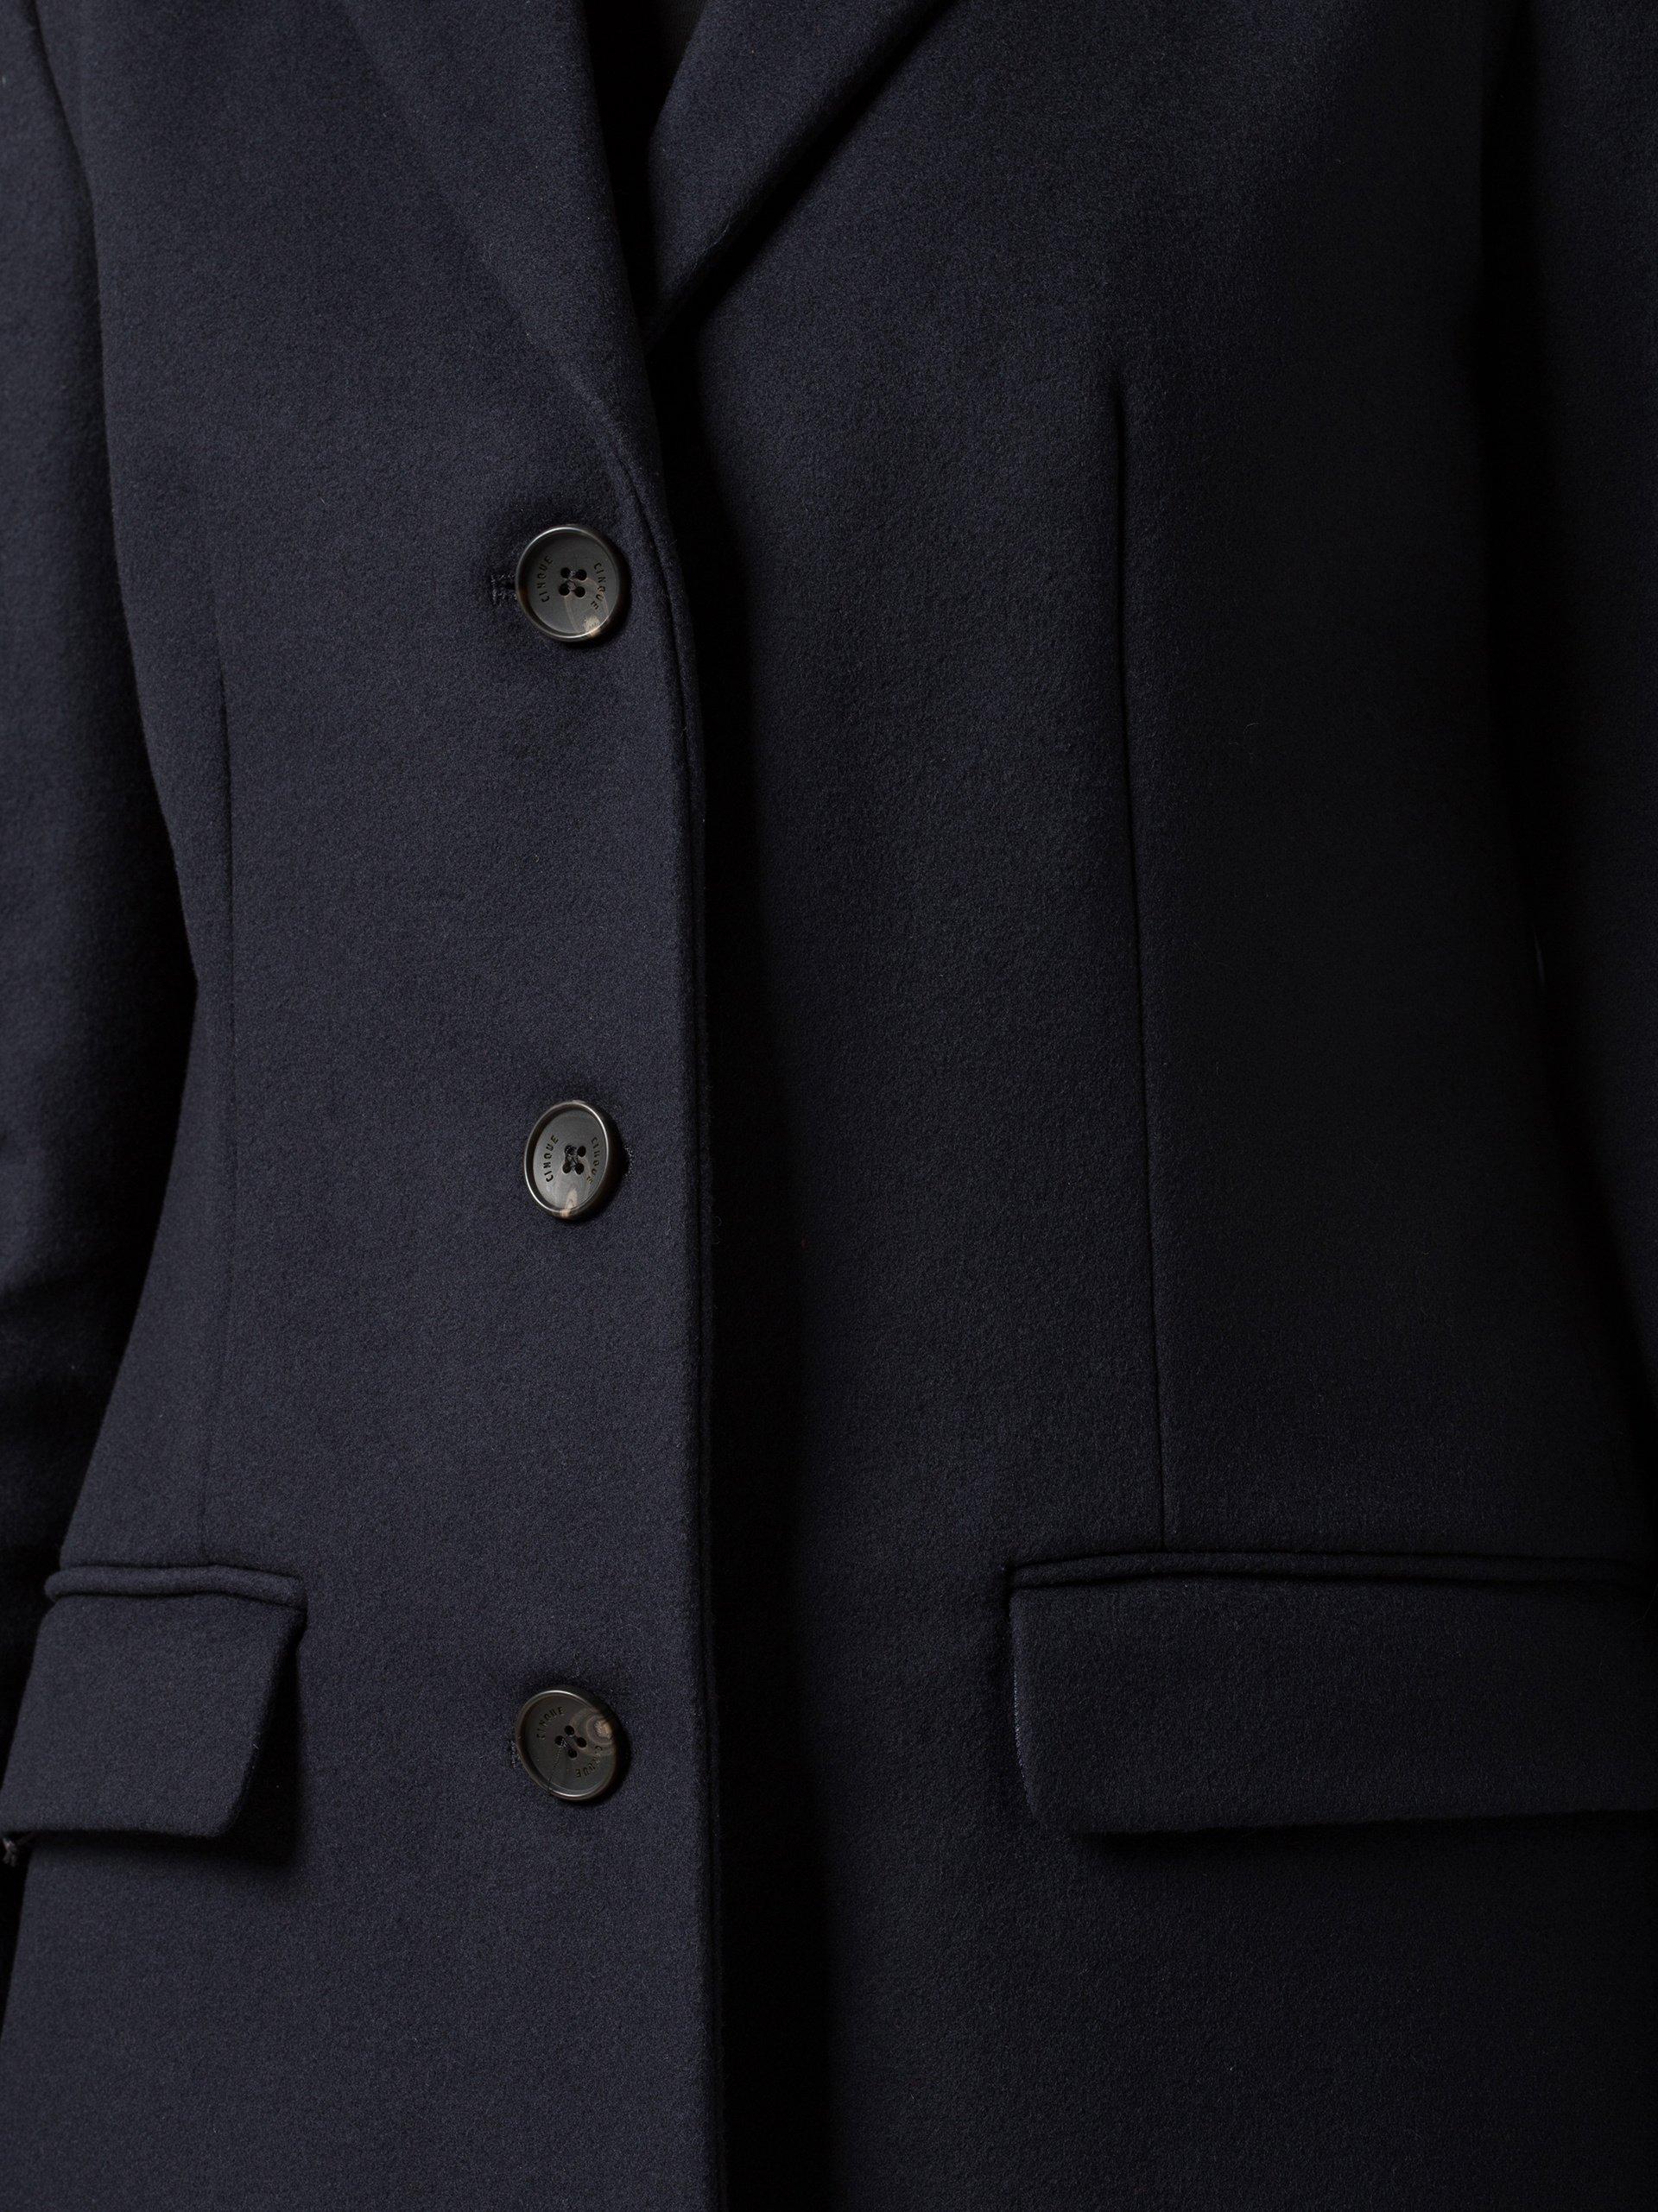 cinque damen mantel mit cashmere anteil marine uni online kaufen vangraaf com. Black Bedroom Furniture Sets. Home Design Ideas